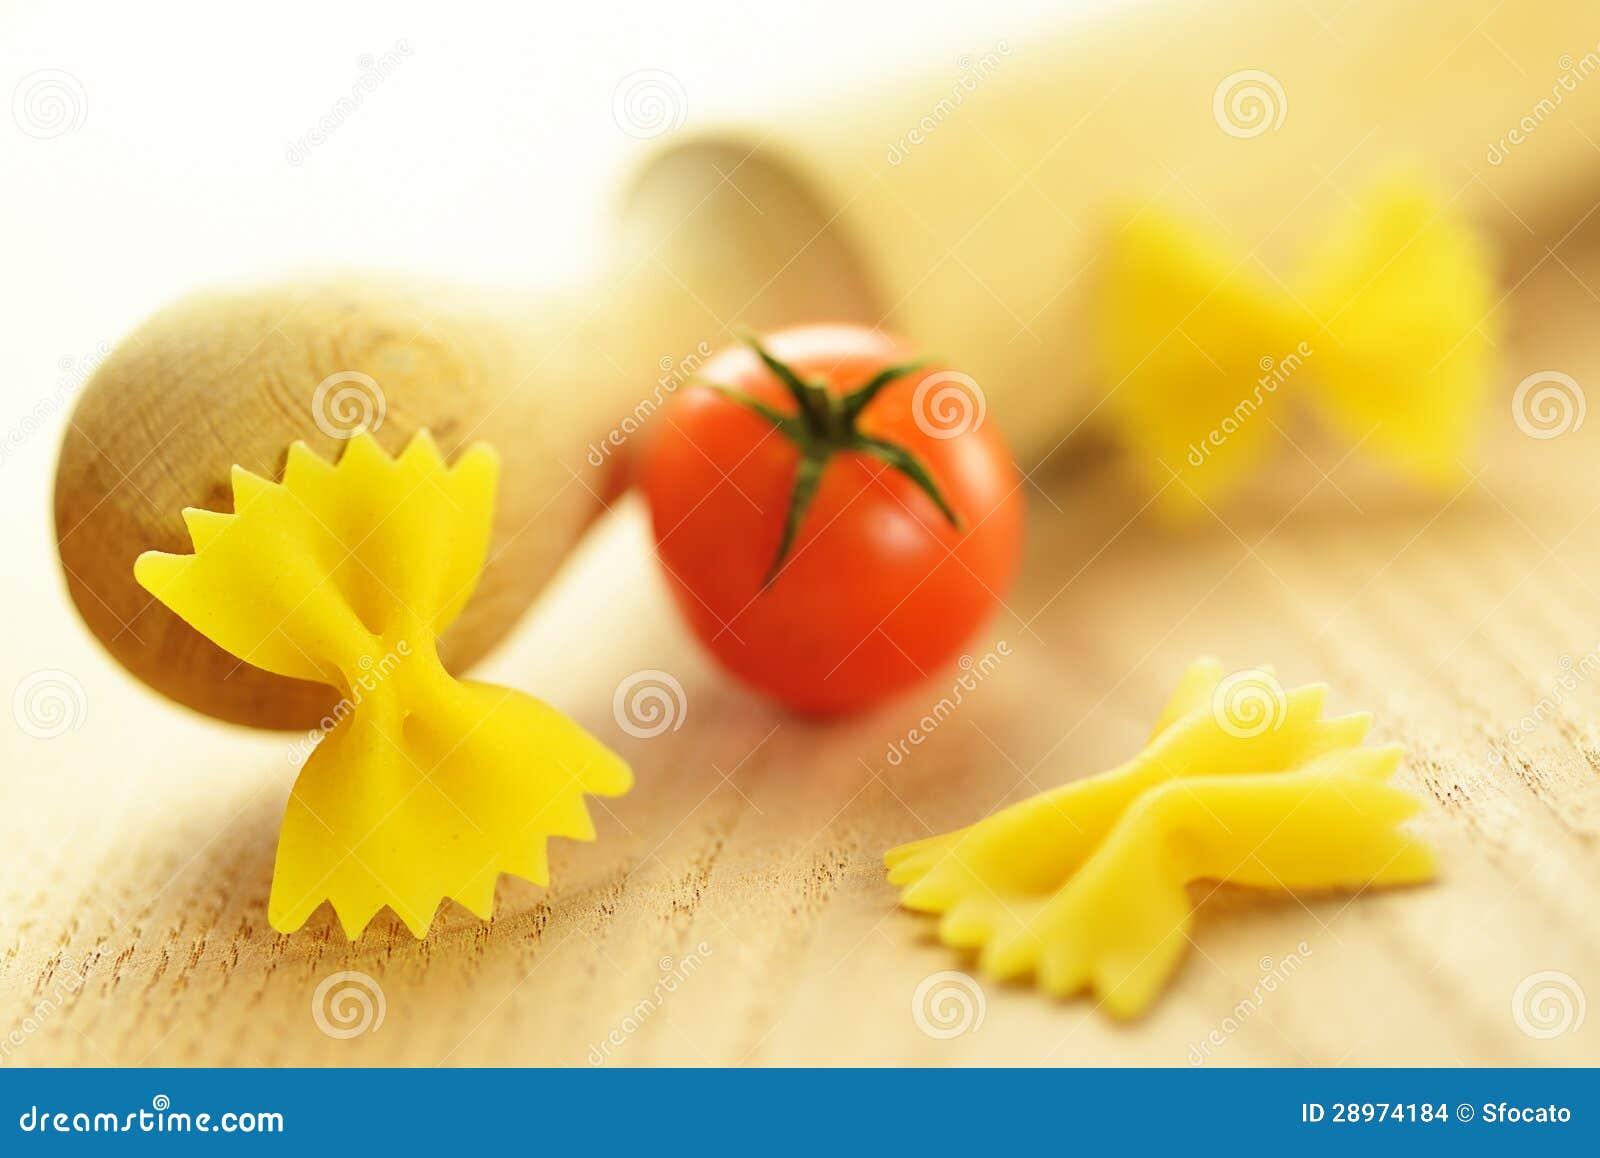 Farfalle, włoski surowy makaron